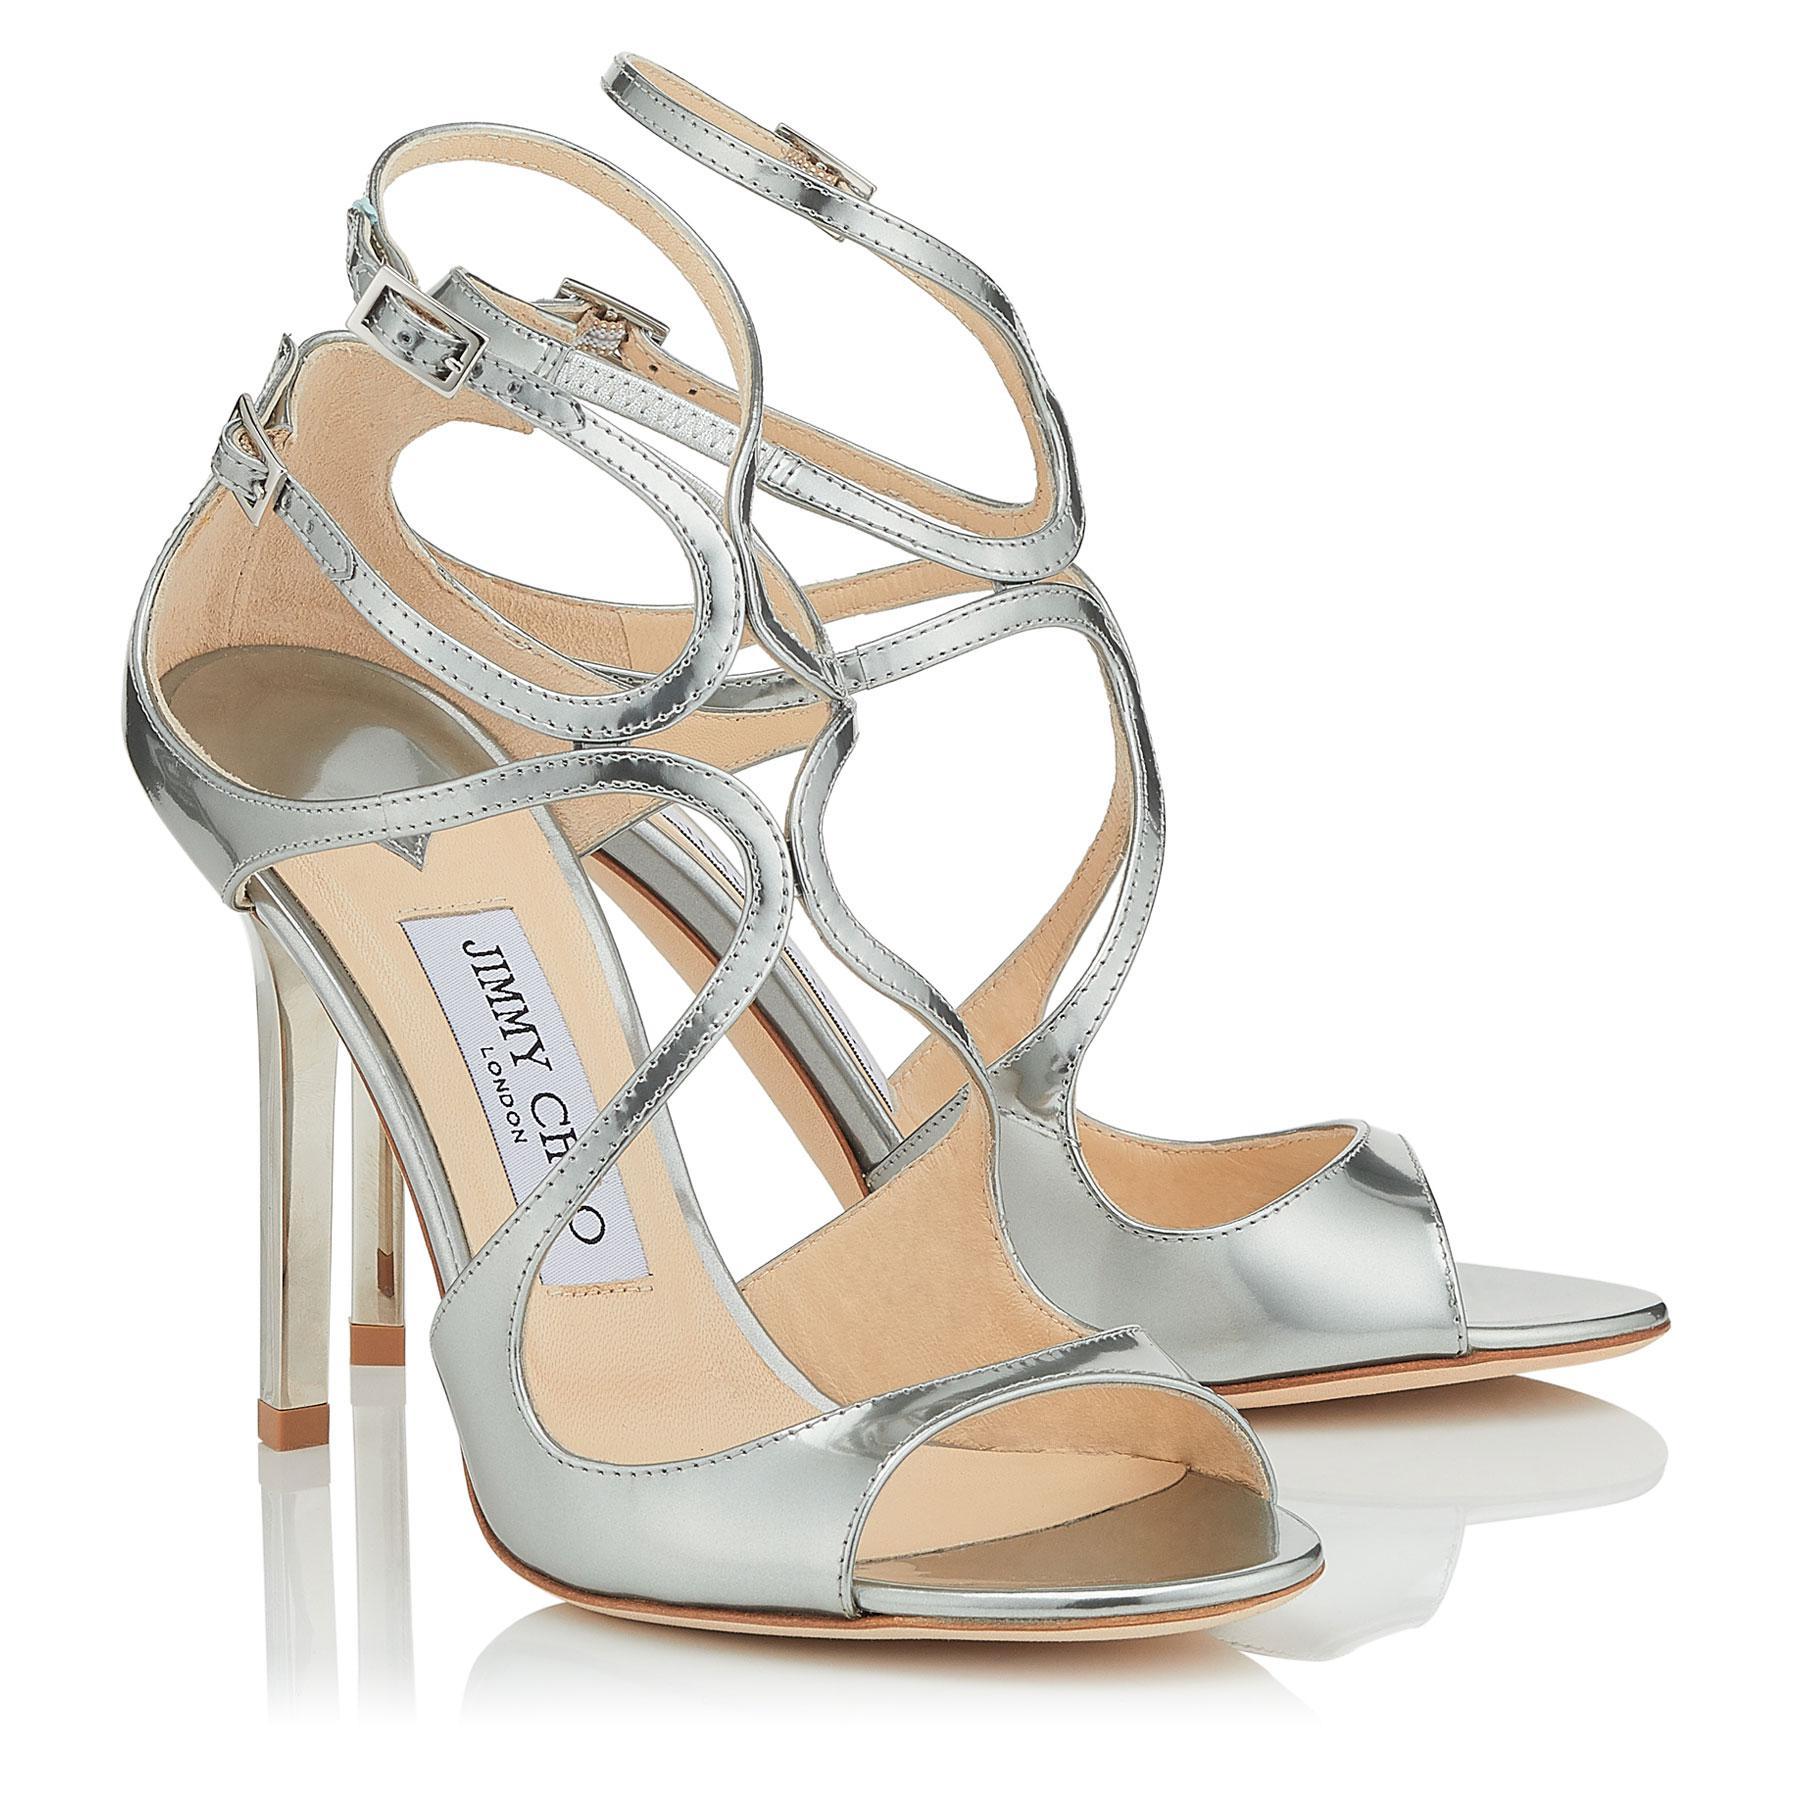 9817b0603322 Lyst - Jimmy Choo Lang Gold Liquid Mirror Leather Sandals in Metallic